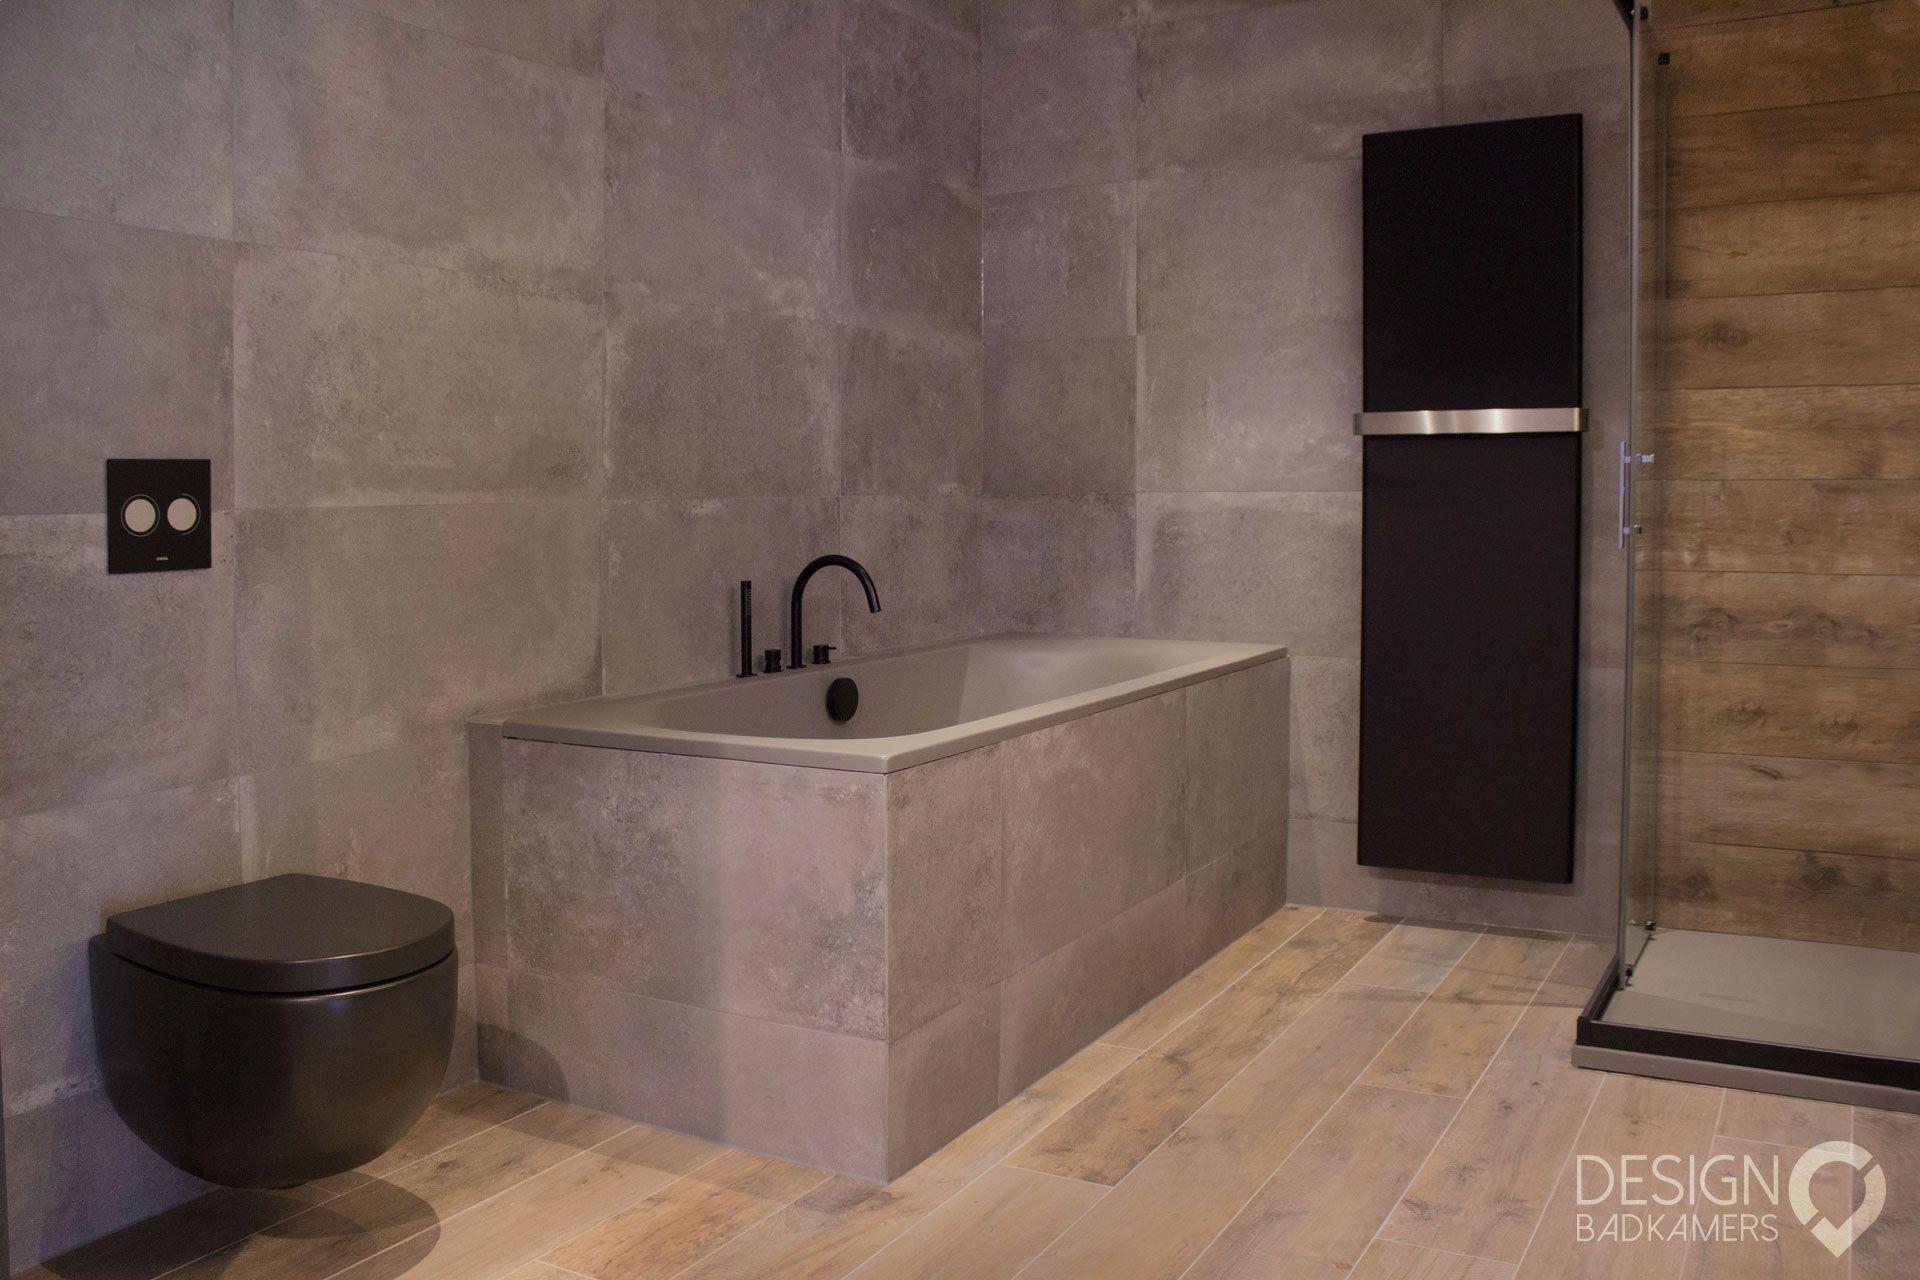 Grote Zwarte Tegels : Moderne maatwerk badkamer met kerlite tegels met houtlook op de